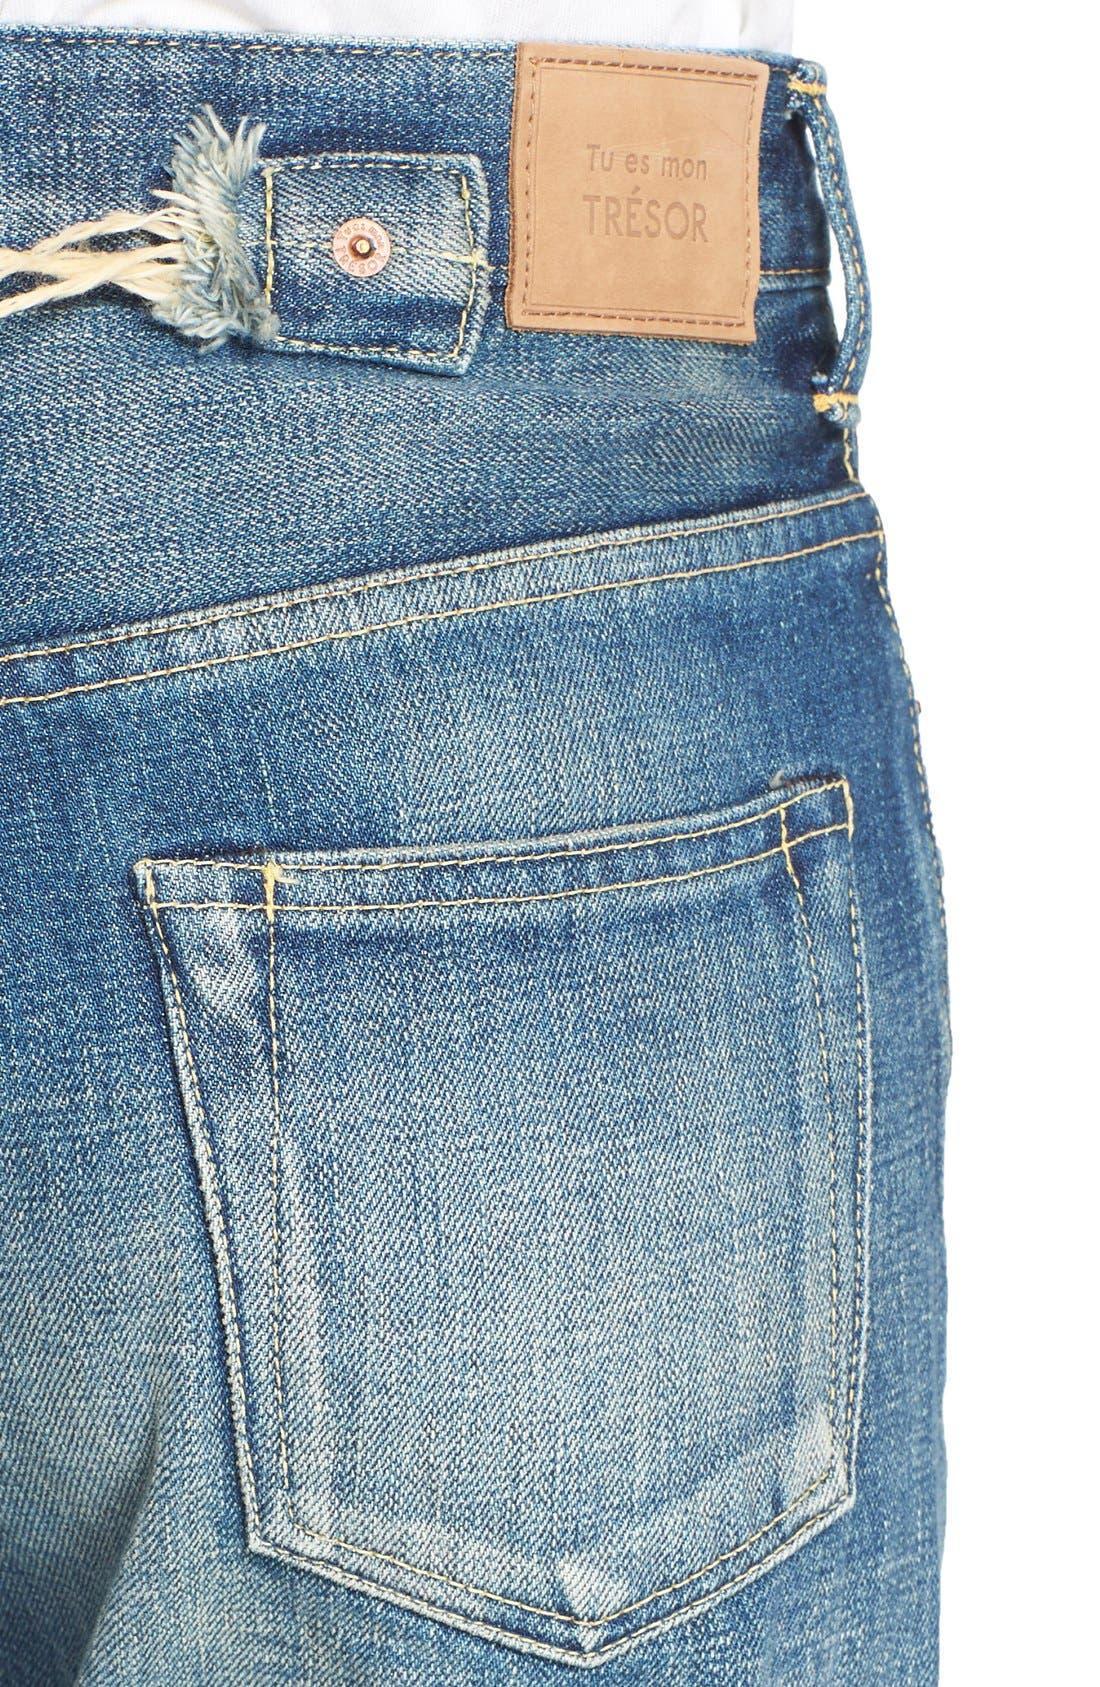 Imitation Pearl Embellished Jeans,                             Alternate thumbnail 6, color,                             101